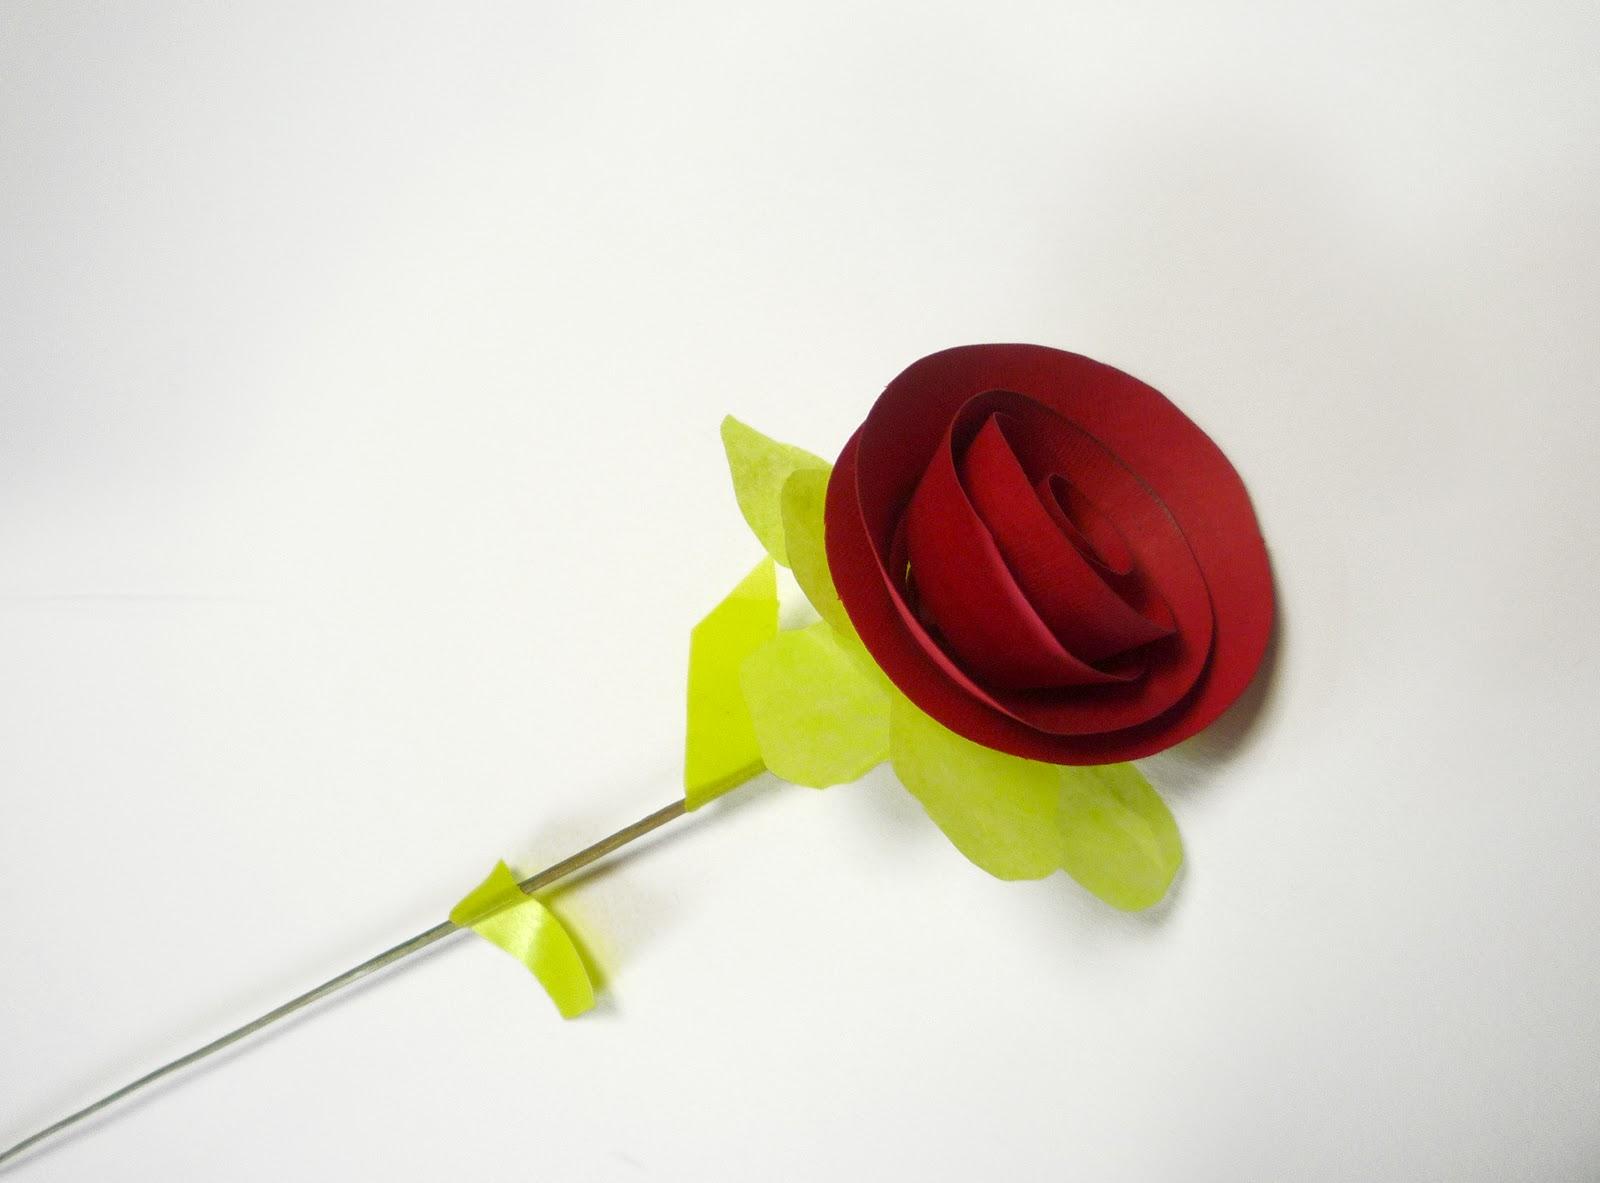 selfpackaging france comment faire une rose en papier. Black Bedroom Furniture Sets. Home Design Ideas